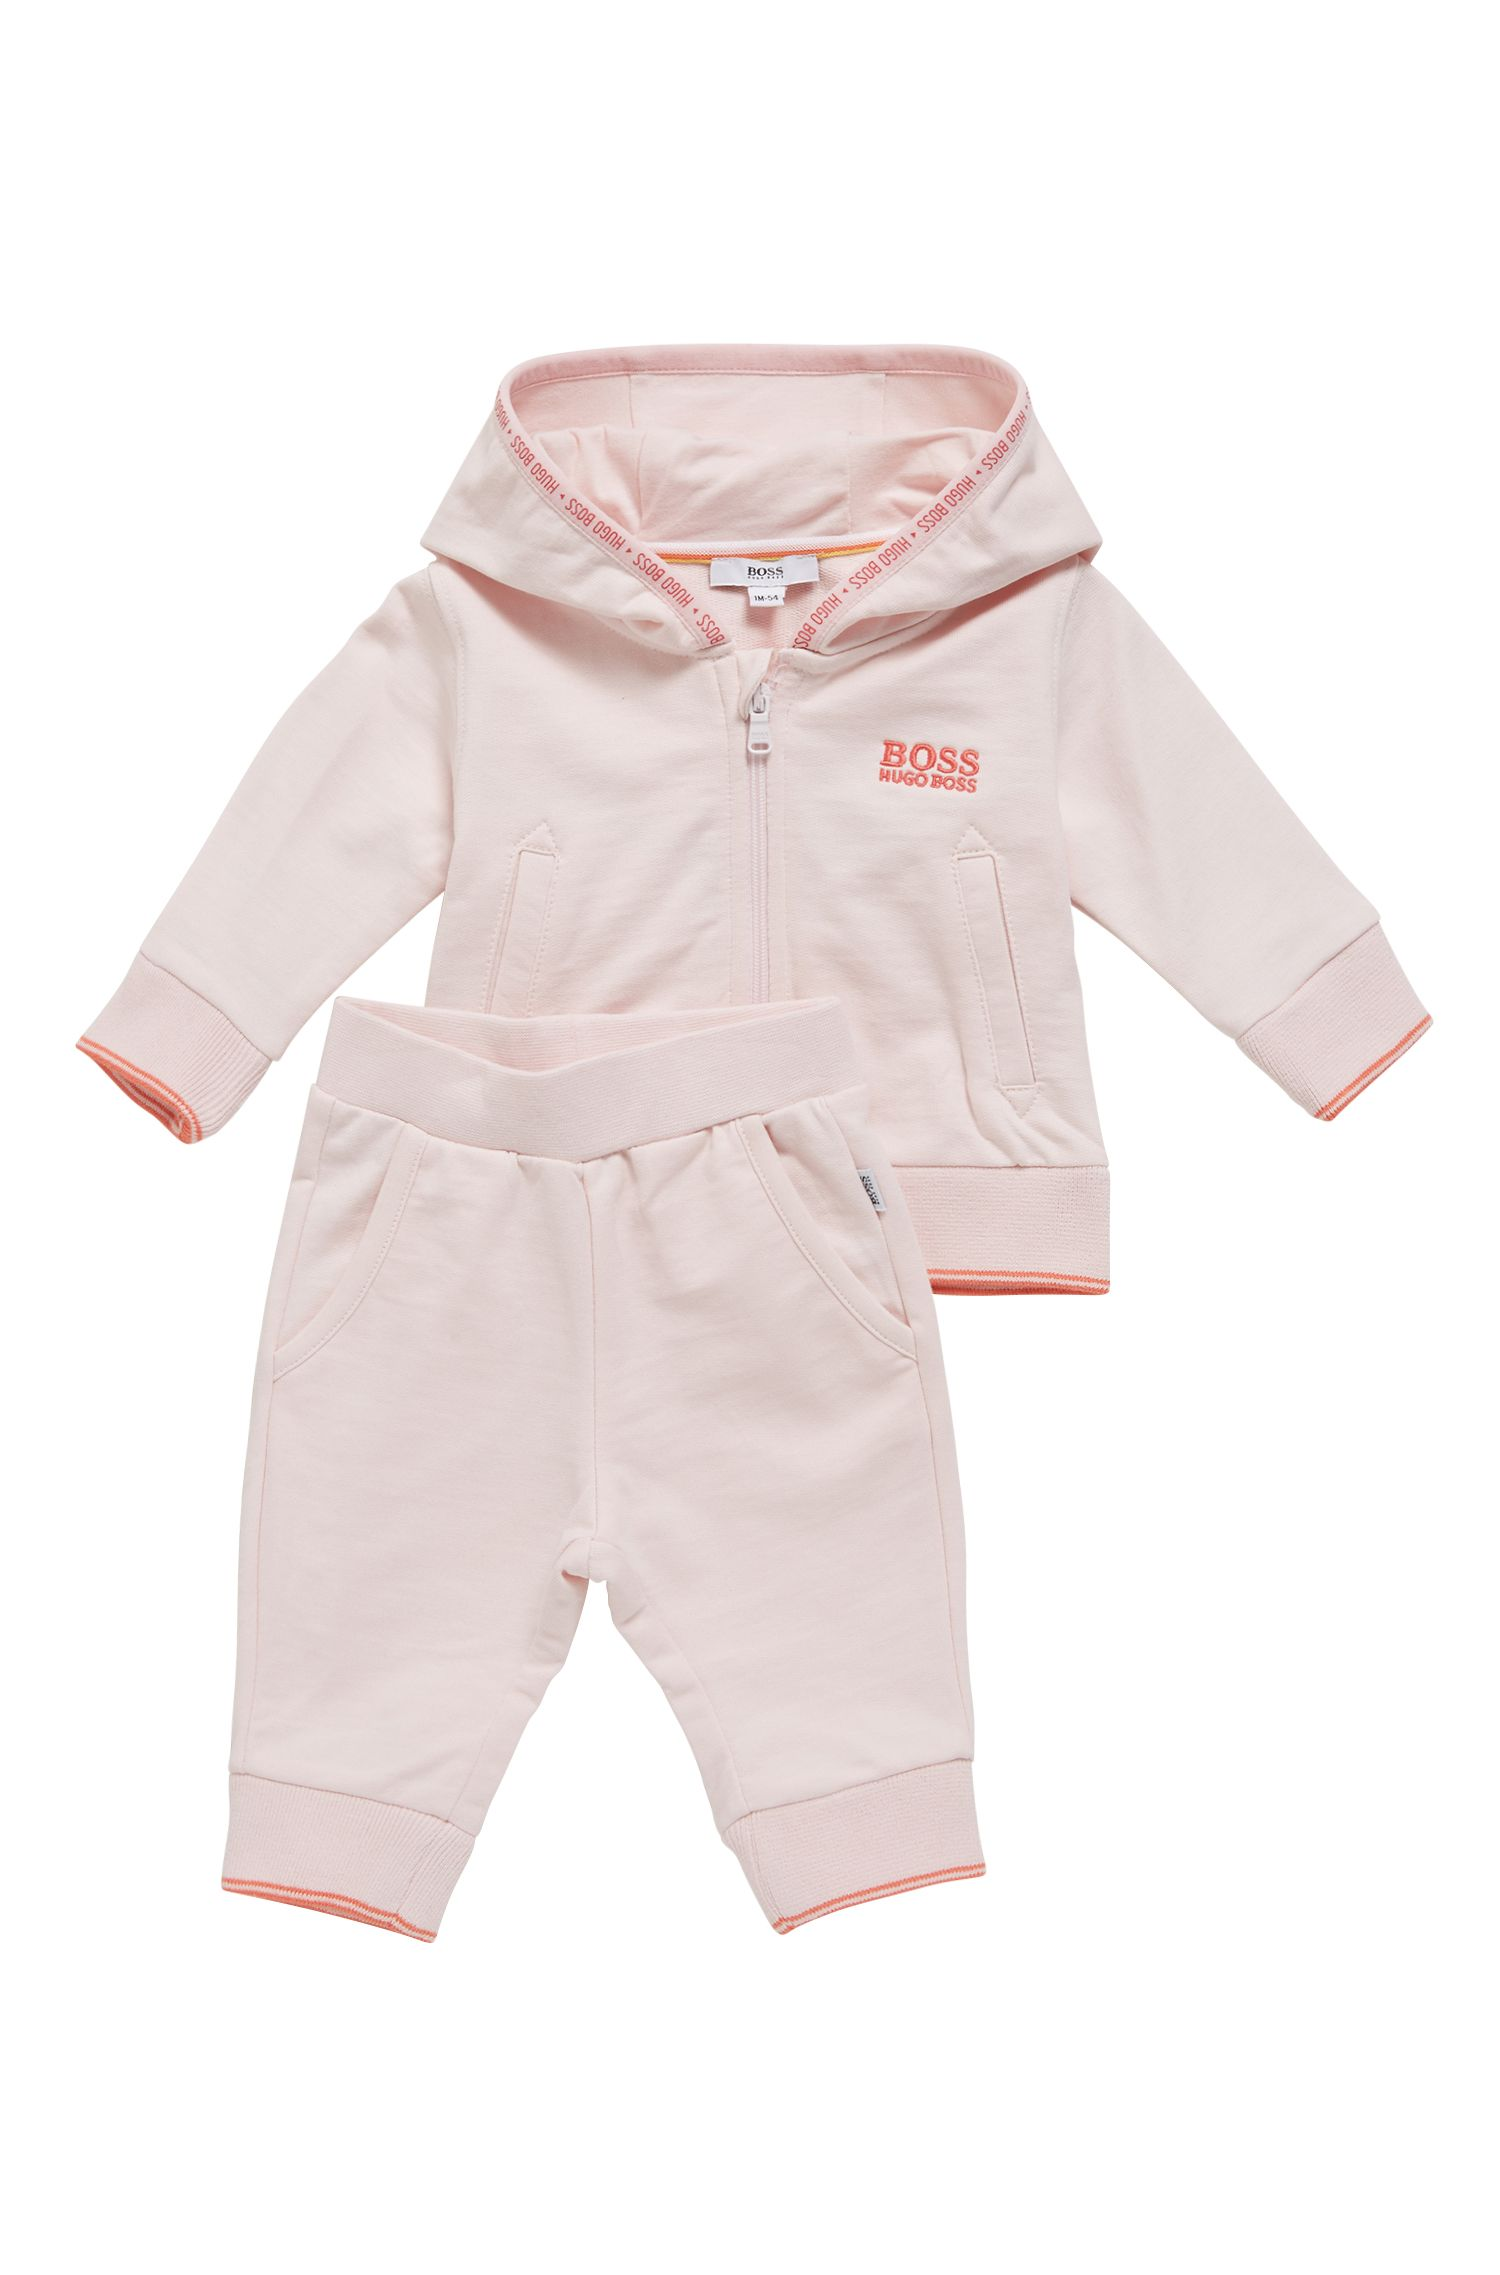 Hugo Boss - Baby-Jogginganzug aus Baumwolle - 1